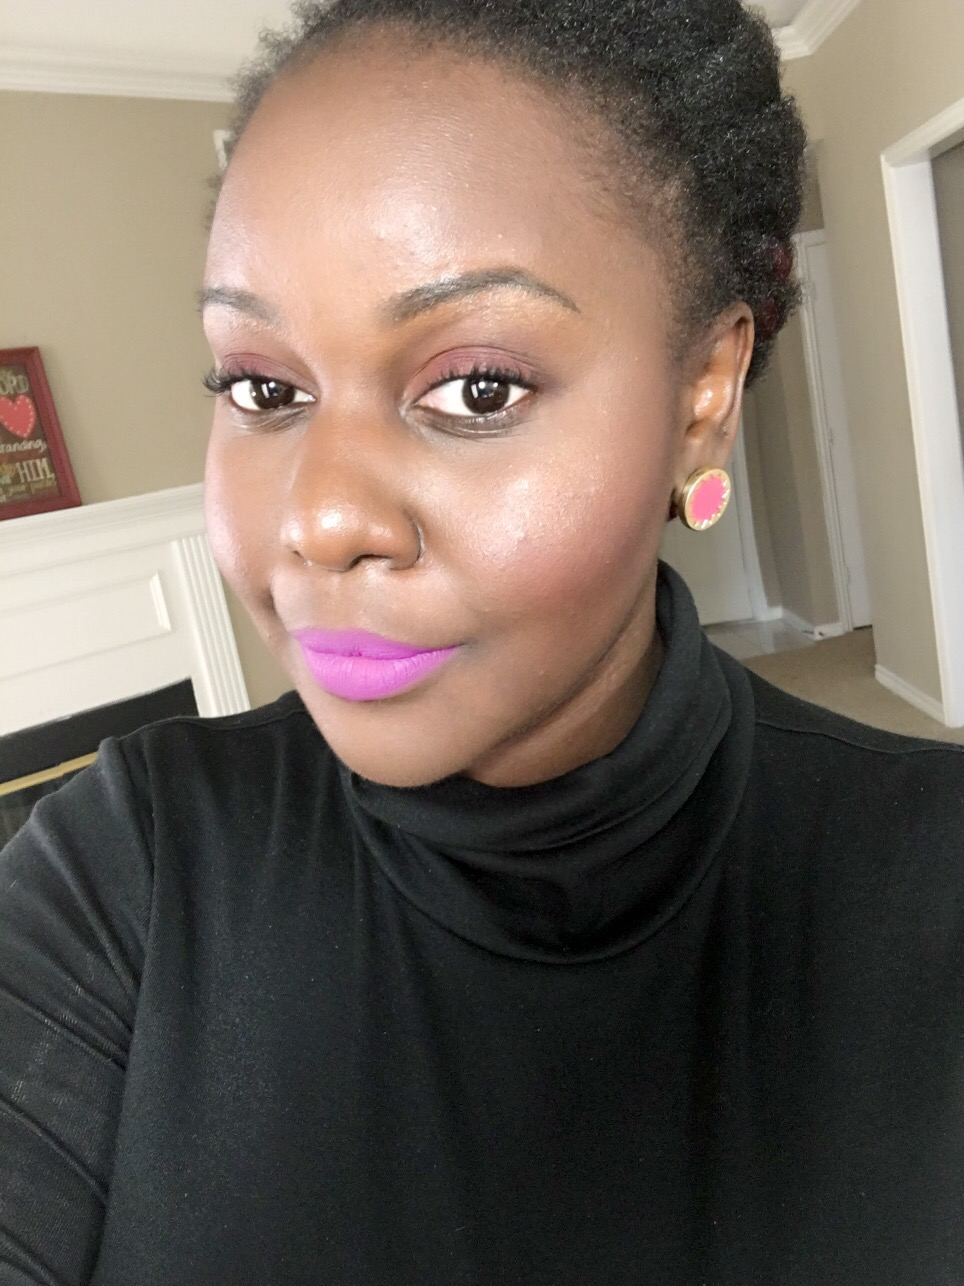 L.U.V Kat Von D Everlasting Liquid Lipsticks Review on Dark Skin Black Women of color